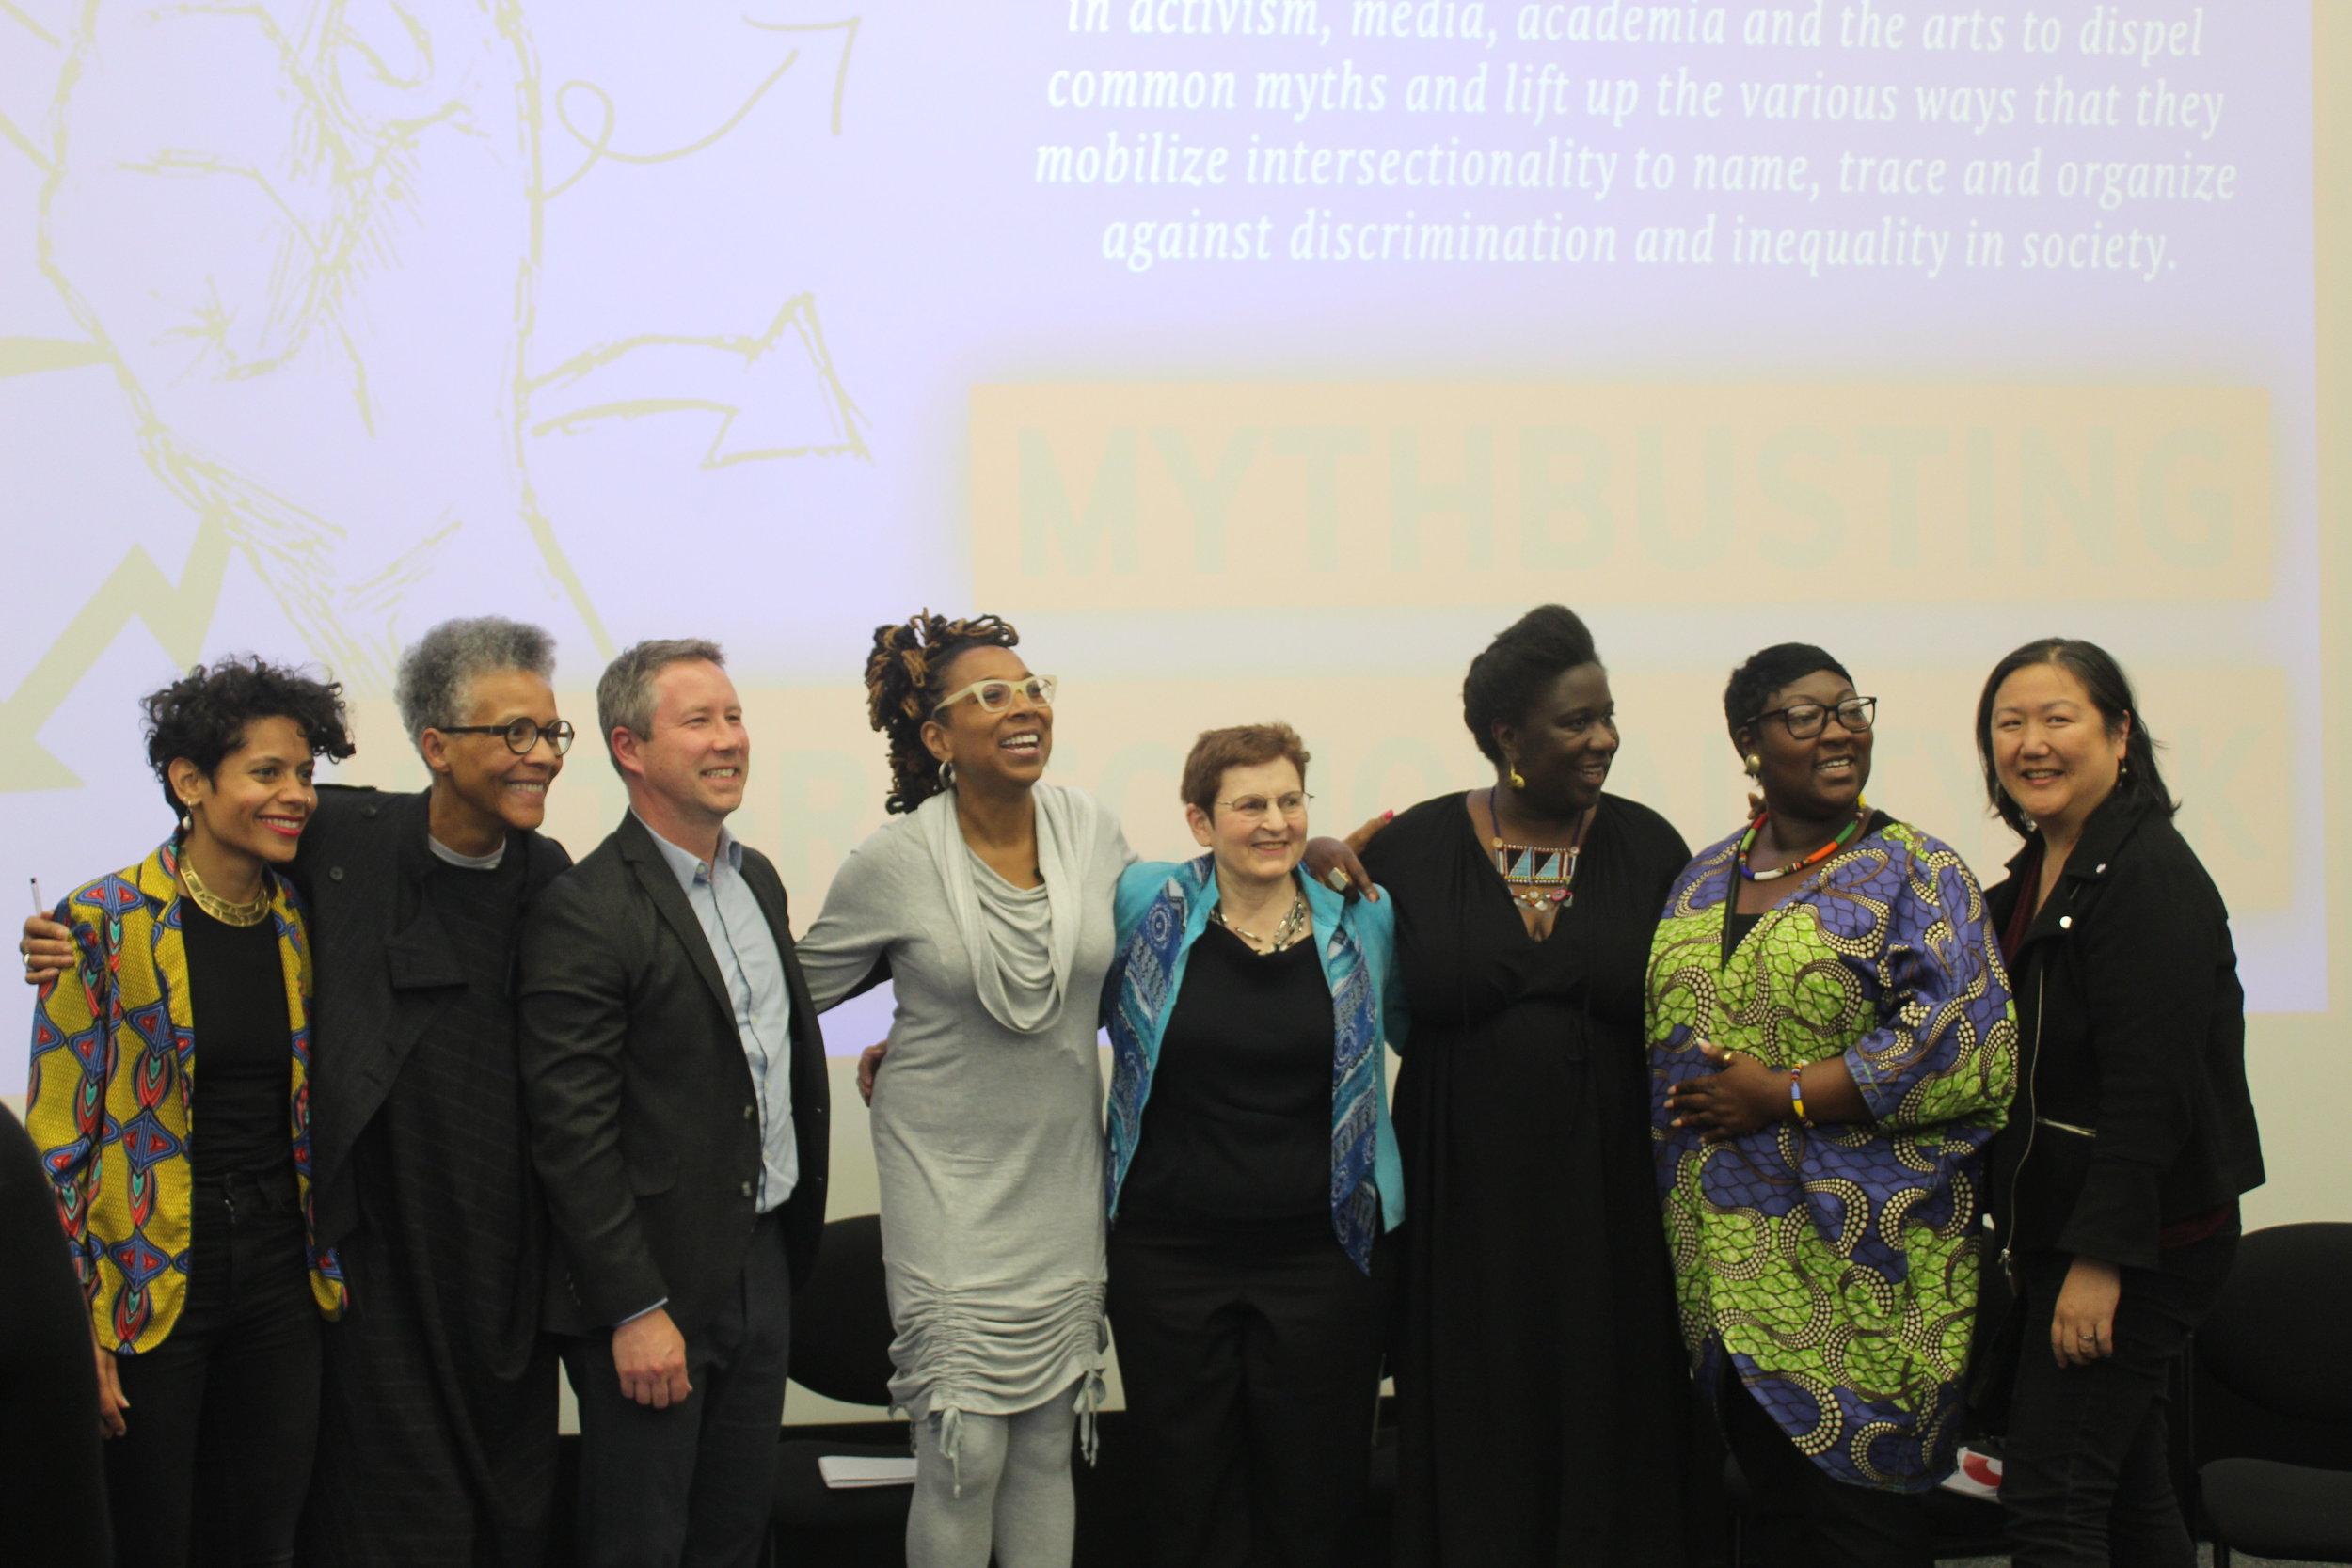 Emilia Roig, Gail Lewis, Daniel HoSang, Kimberlé Crenshaw, Barbara Tomlinson, Barby Asante, Phyll Opoku-Gyimah and Sumi Cho at  Mythbusting Intersectionality UK  held last week at the University of Westminster.